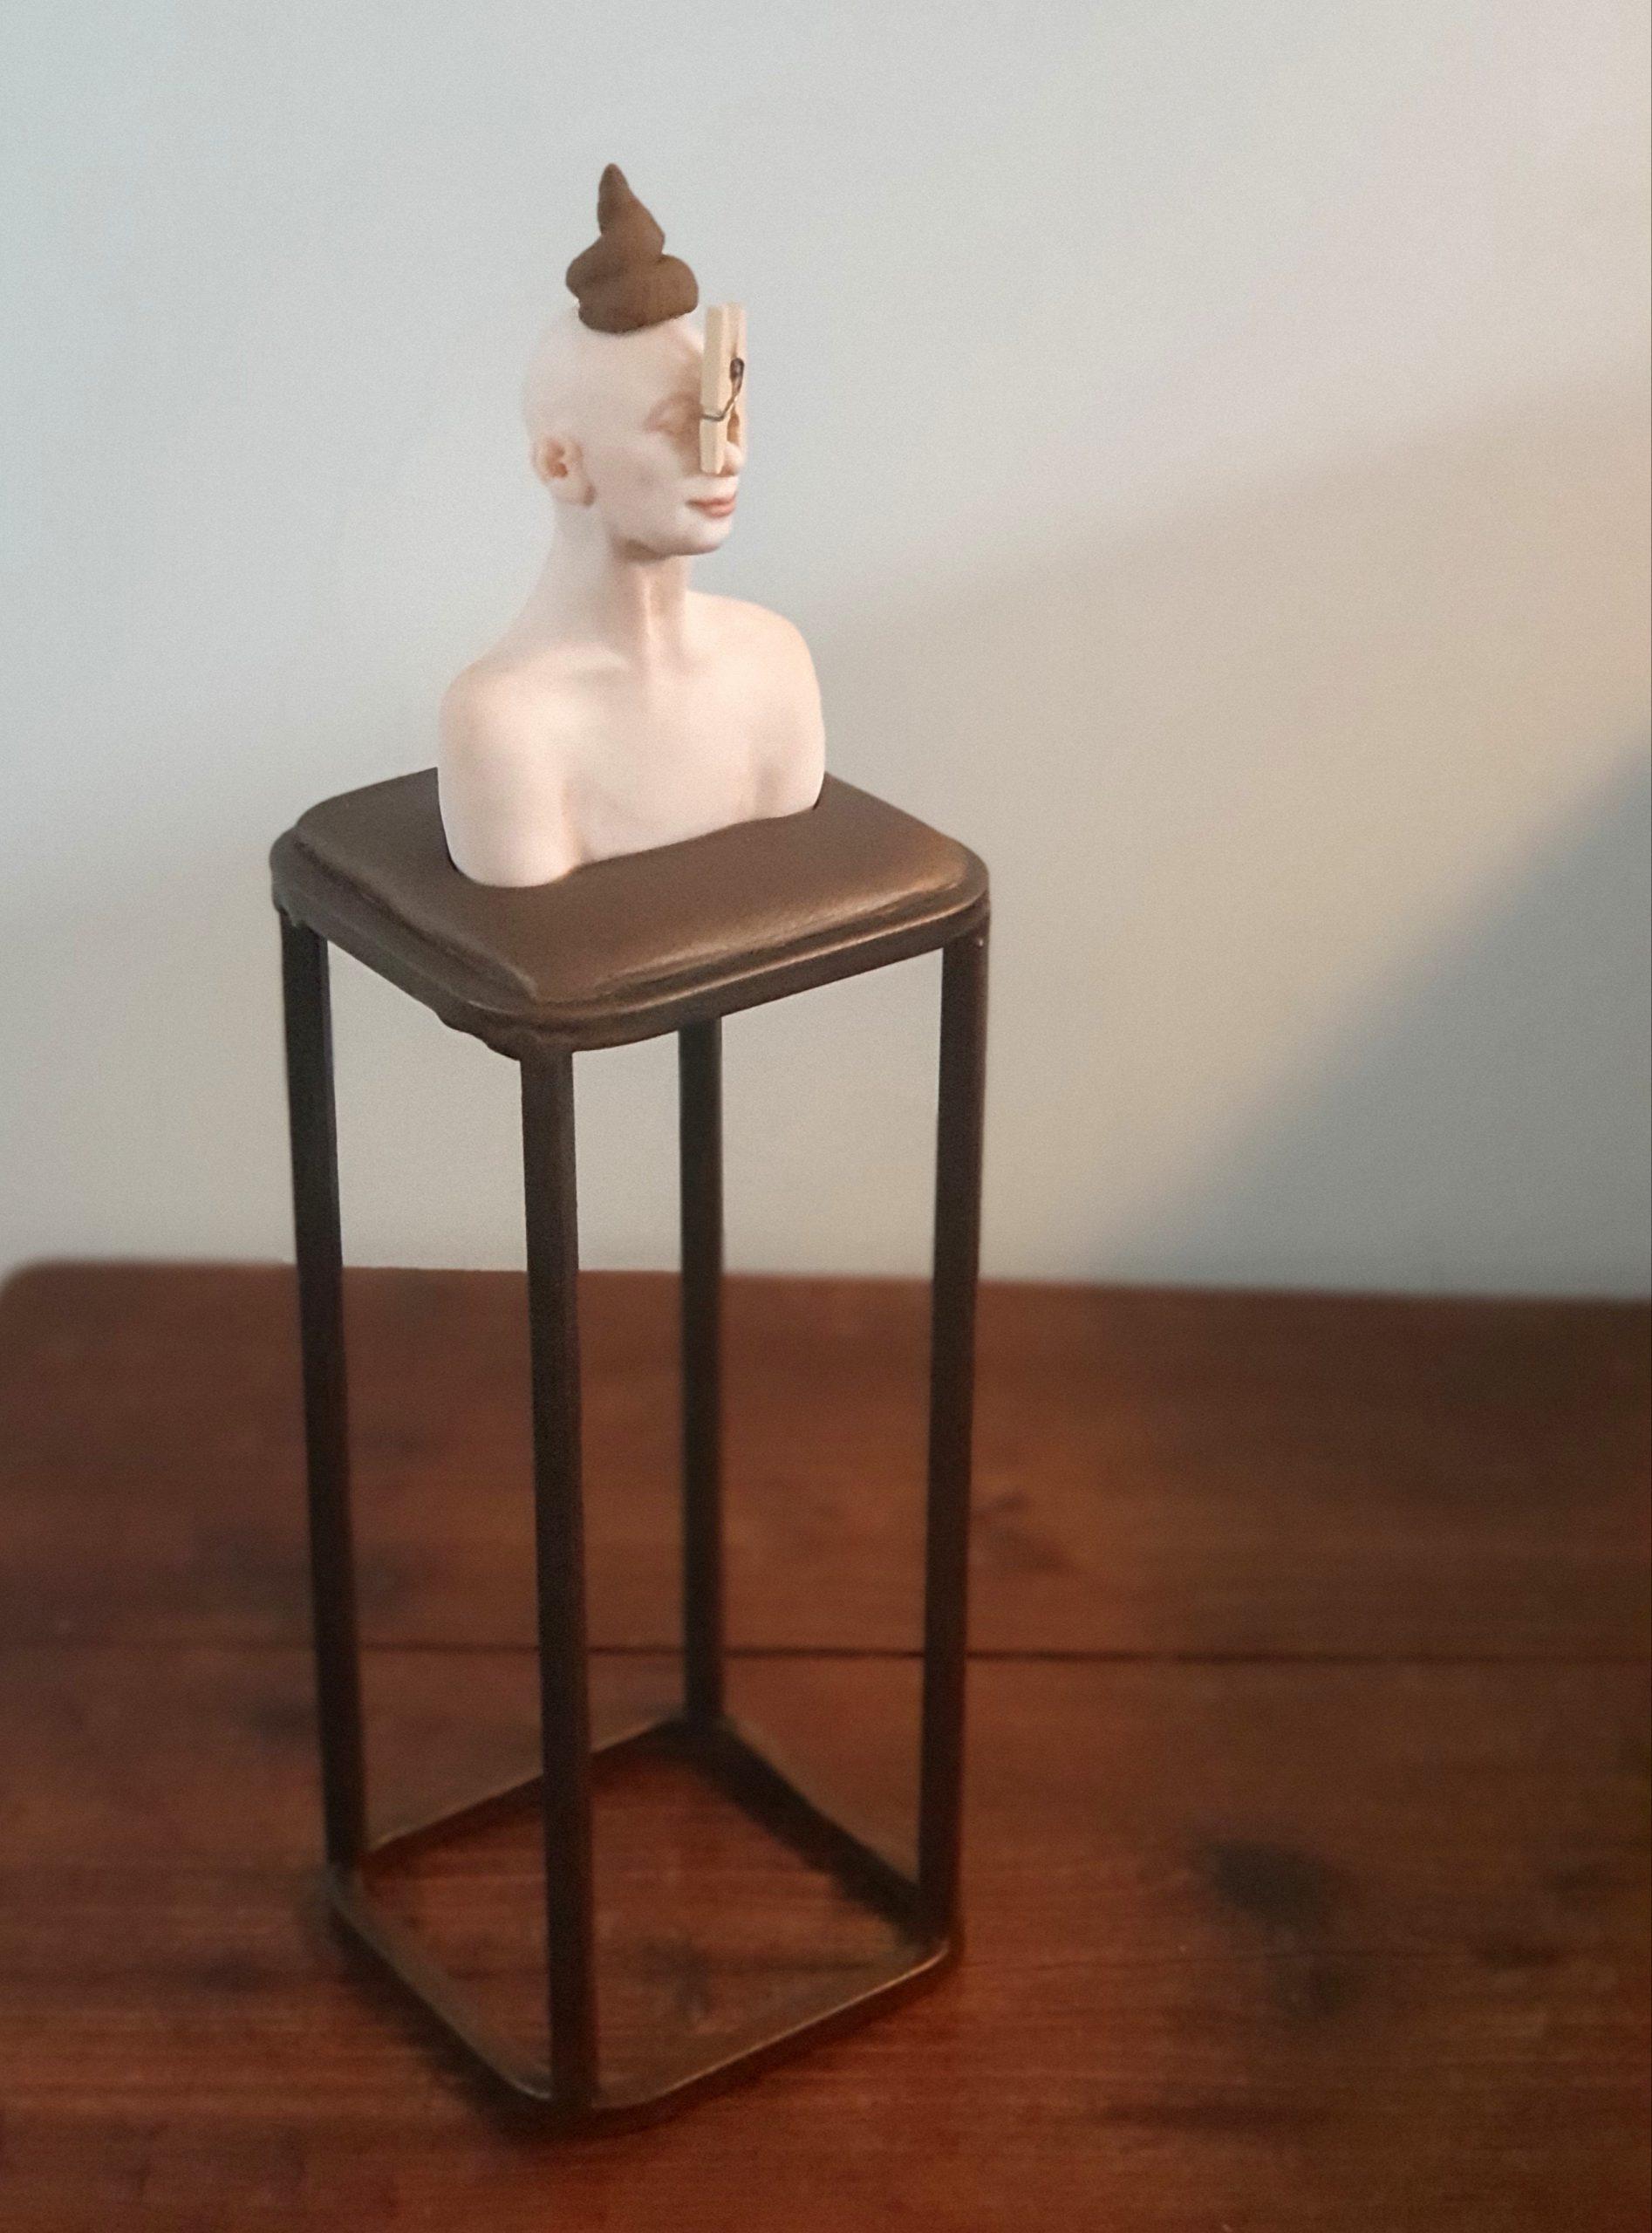 Kunst: Kakkertje van kunstenaar Saskia Hoeboer